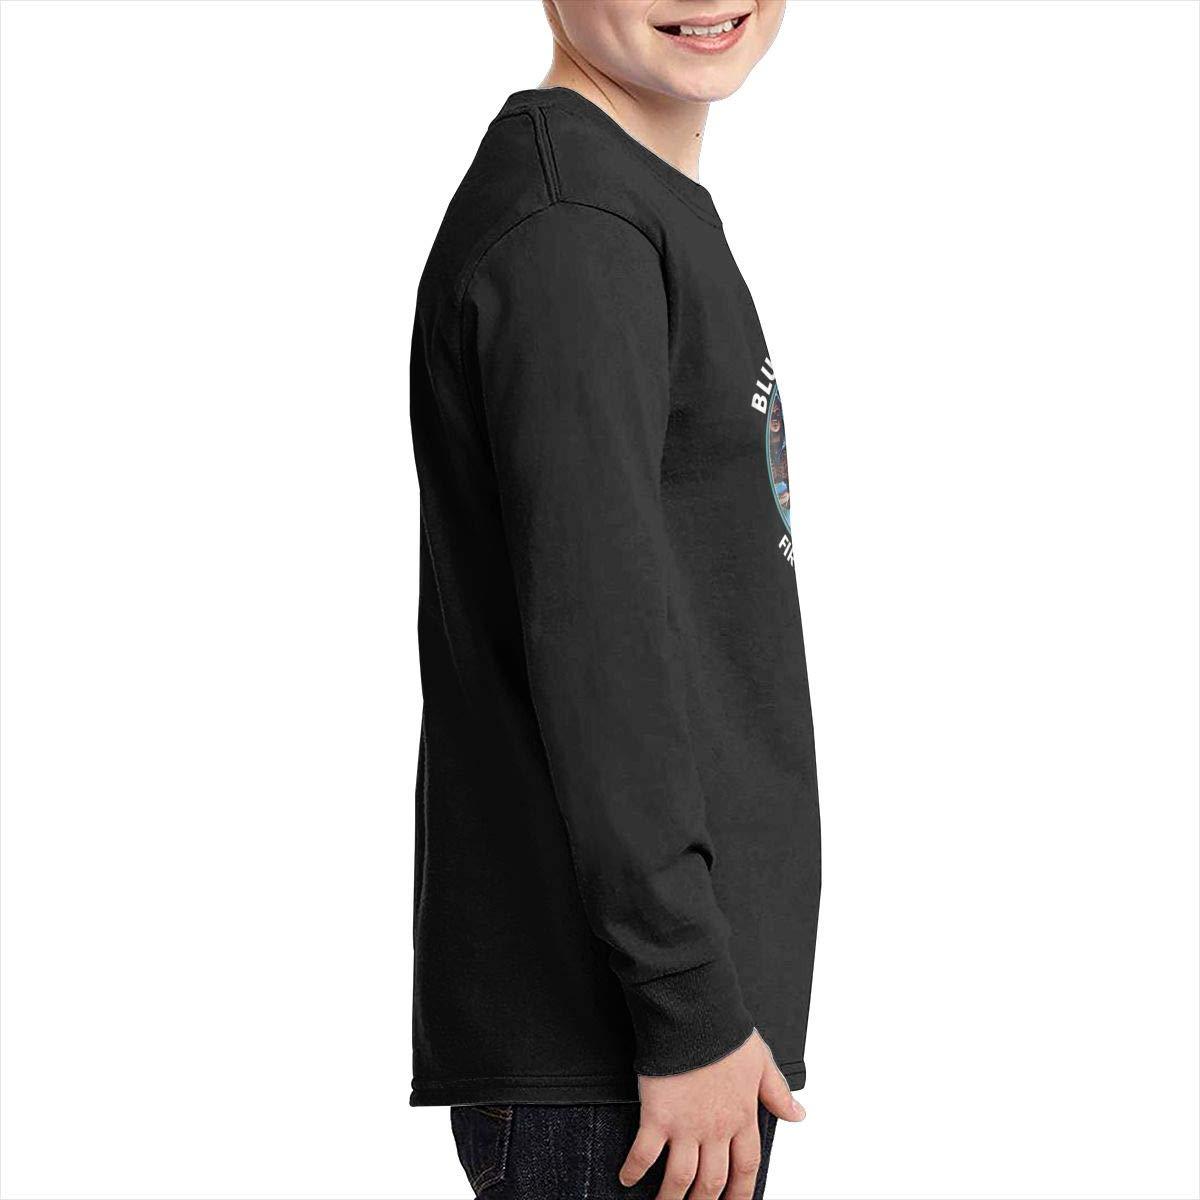 Girls Blue Oyster Cult Boys Fashion Classic Long Sleeve T-Shirt Boy Long Sleeve Cotton Round Neck T-Shirt